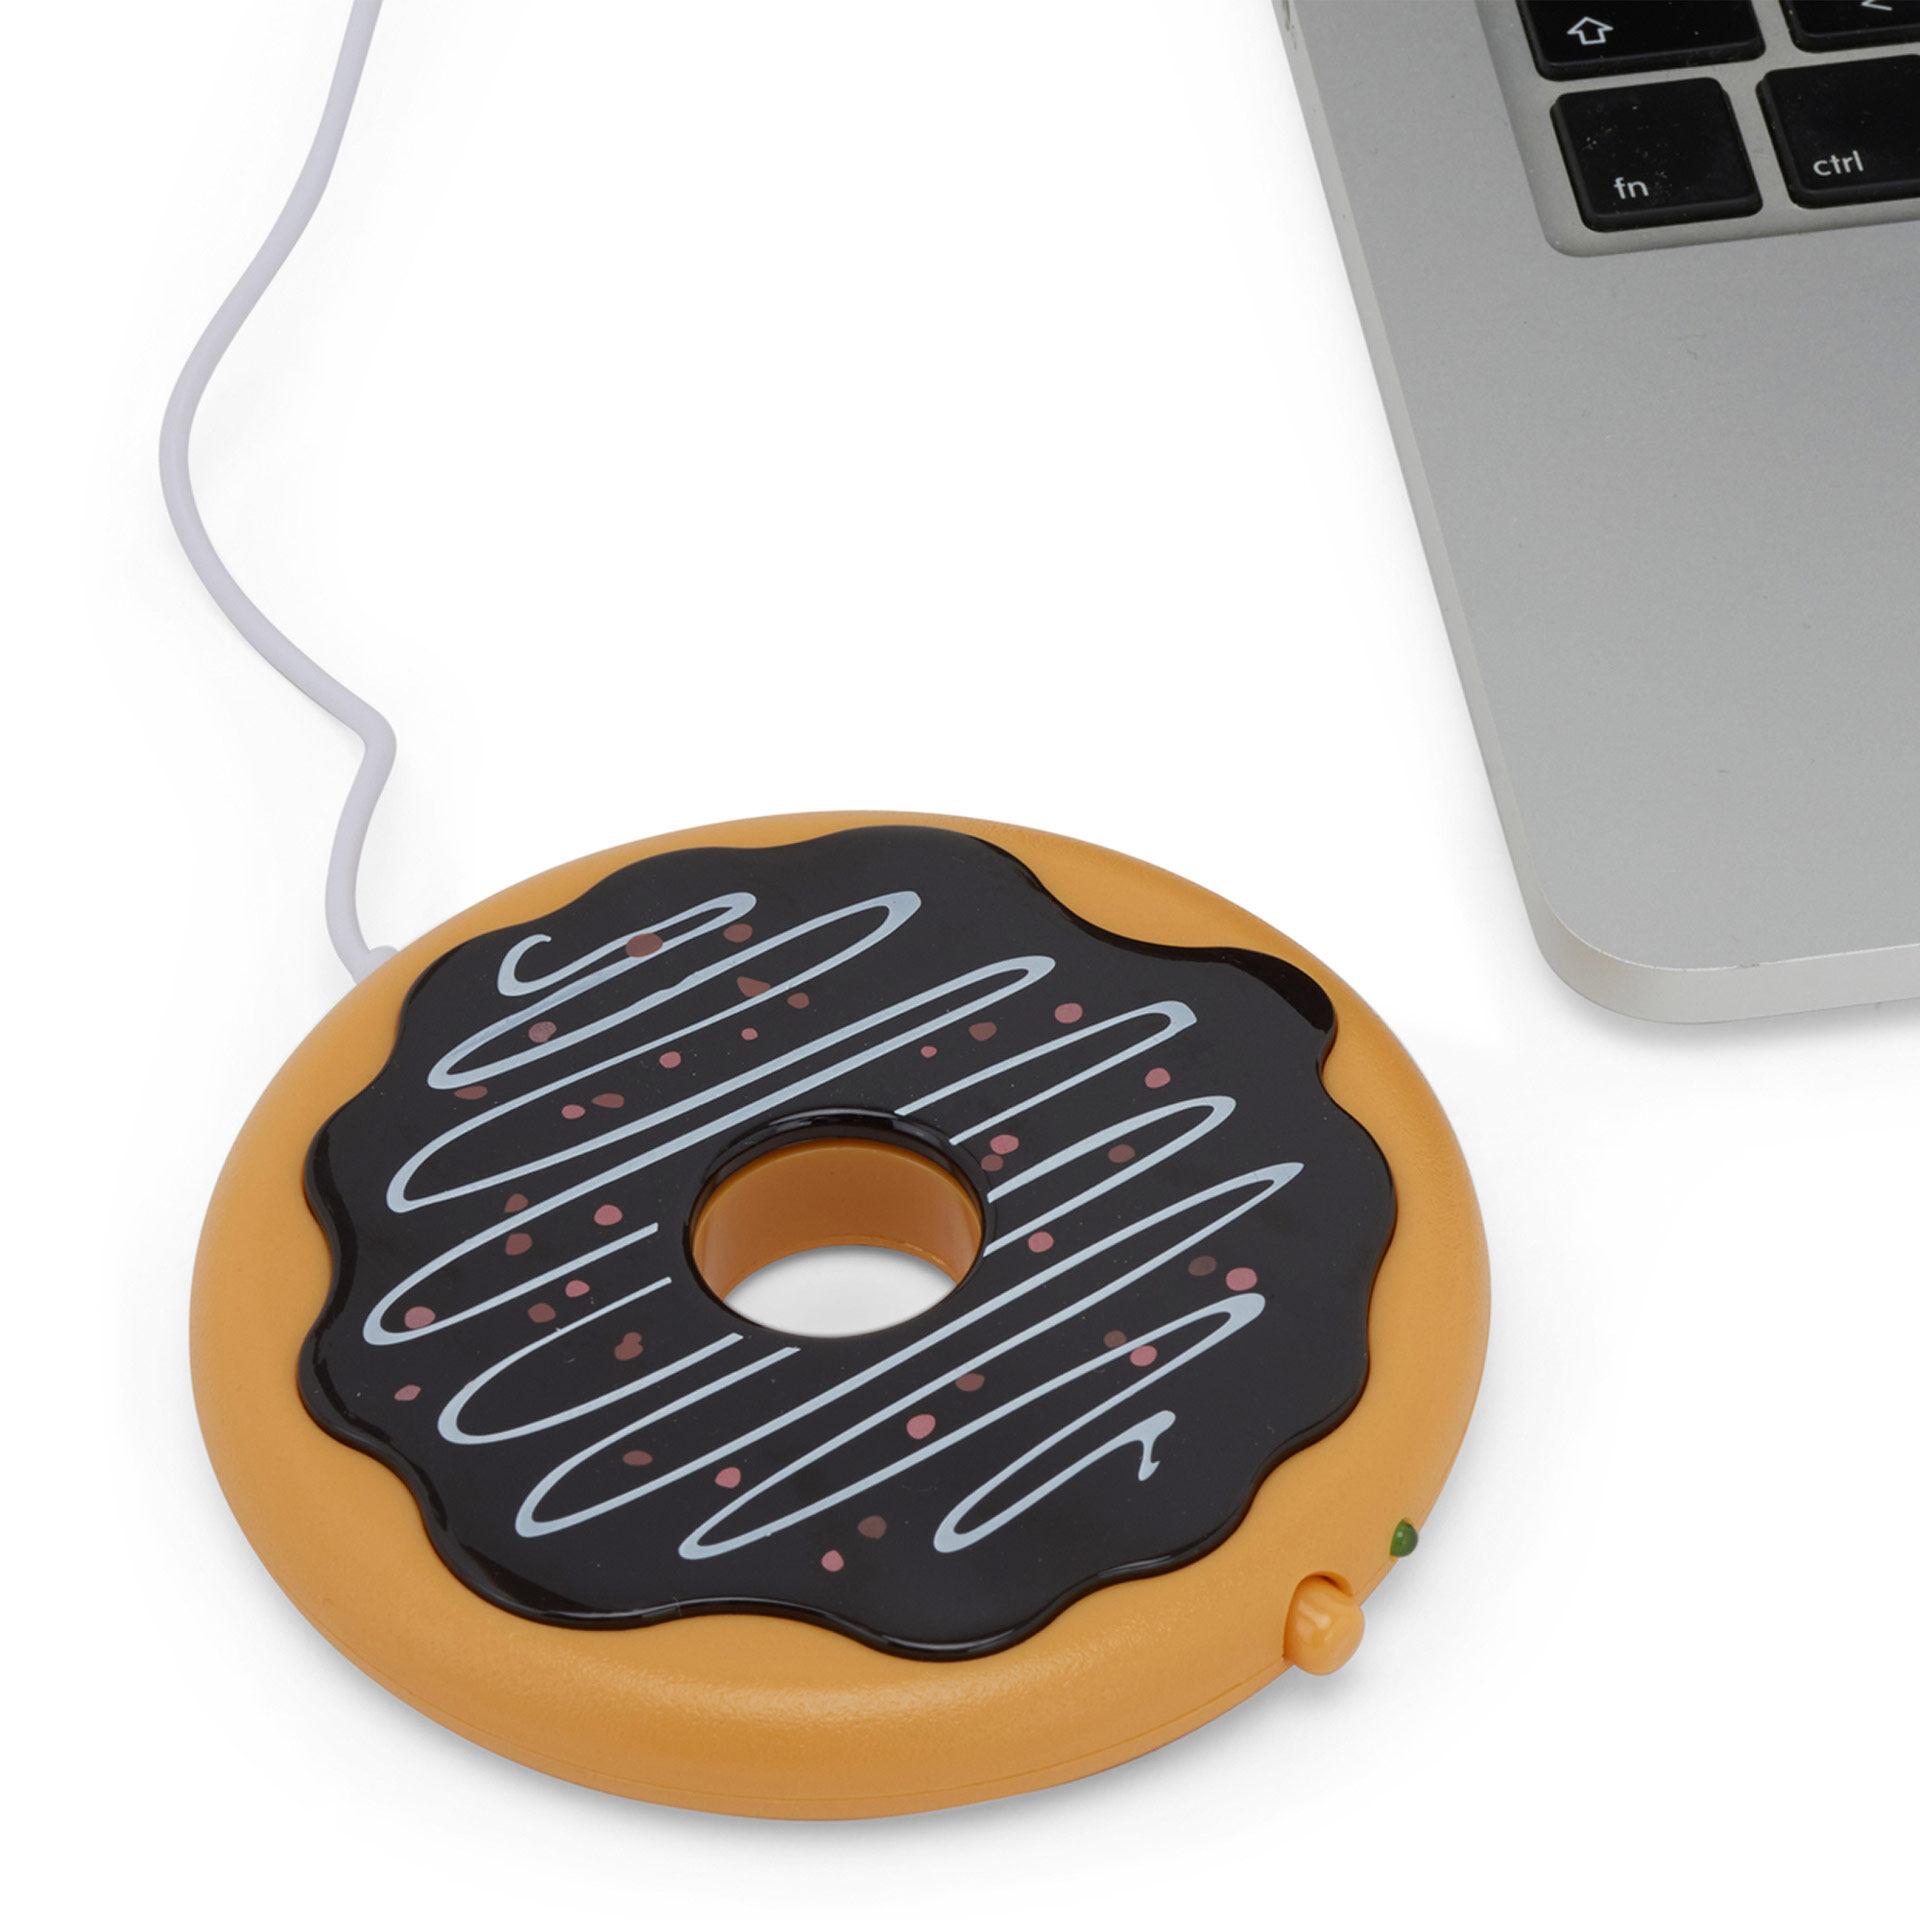 Chauffe-tasse USB beignet - marron, , large